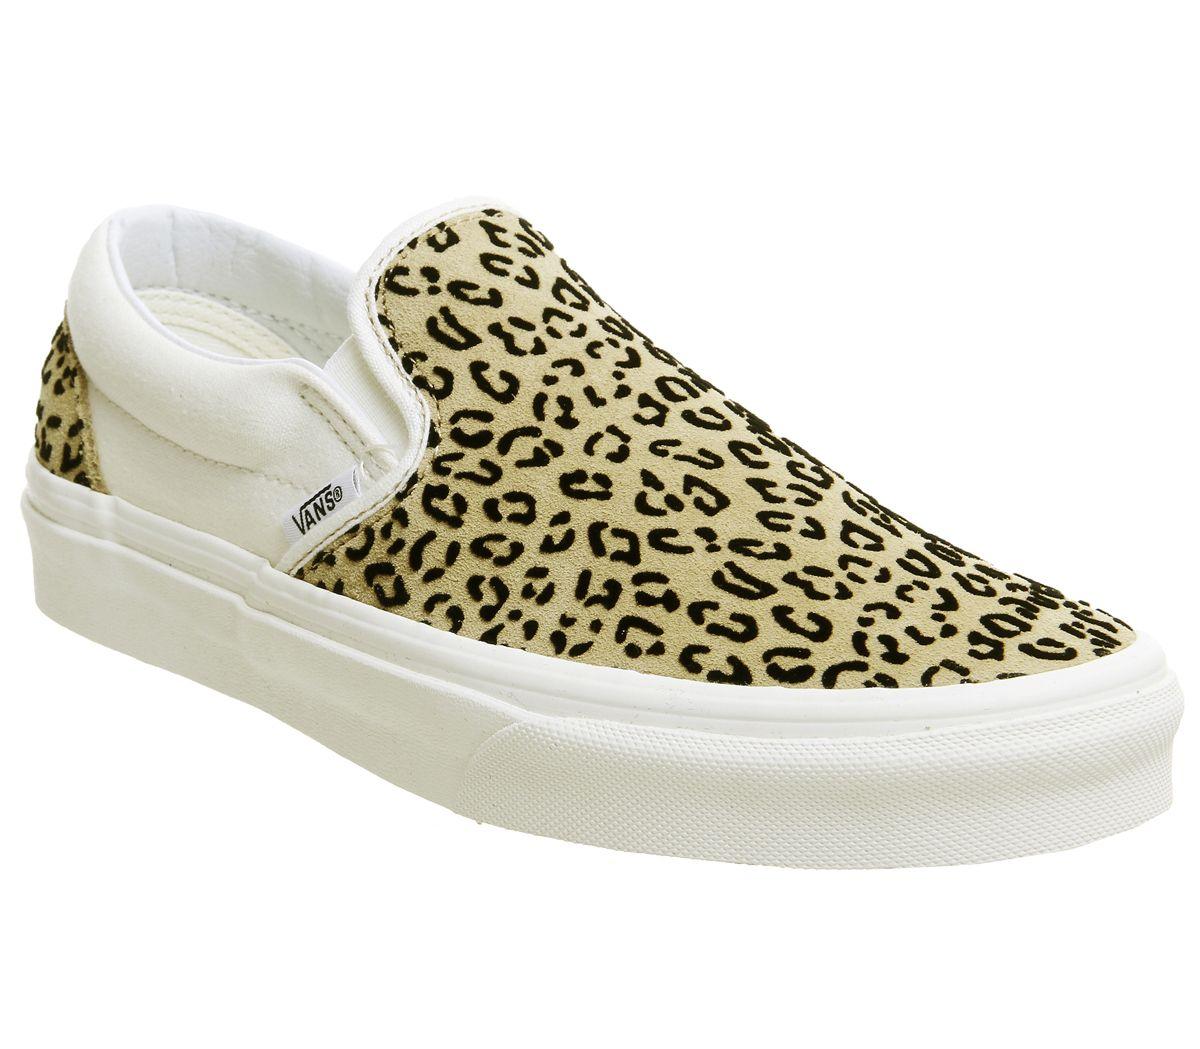 6de3ebb178f4 Vans Vans Classic Slip On Trainers Leopard Taffy Marshmellow ...